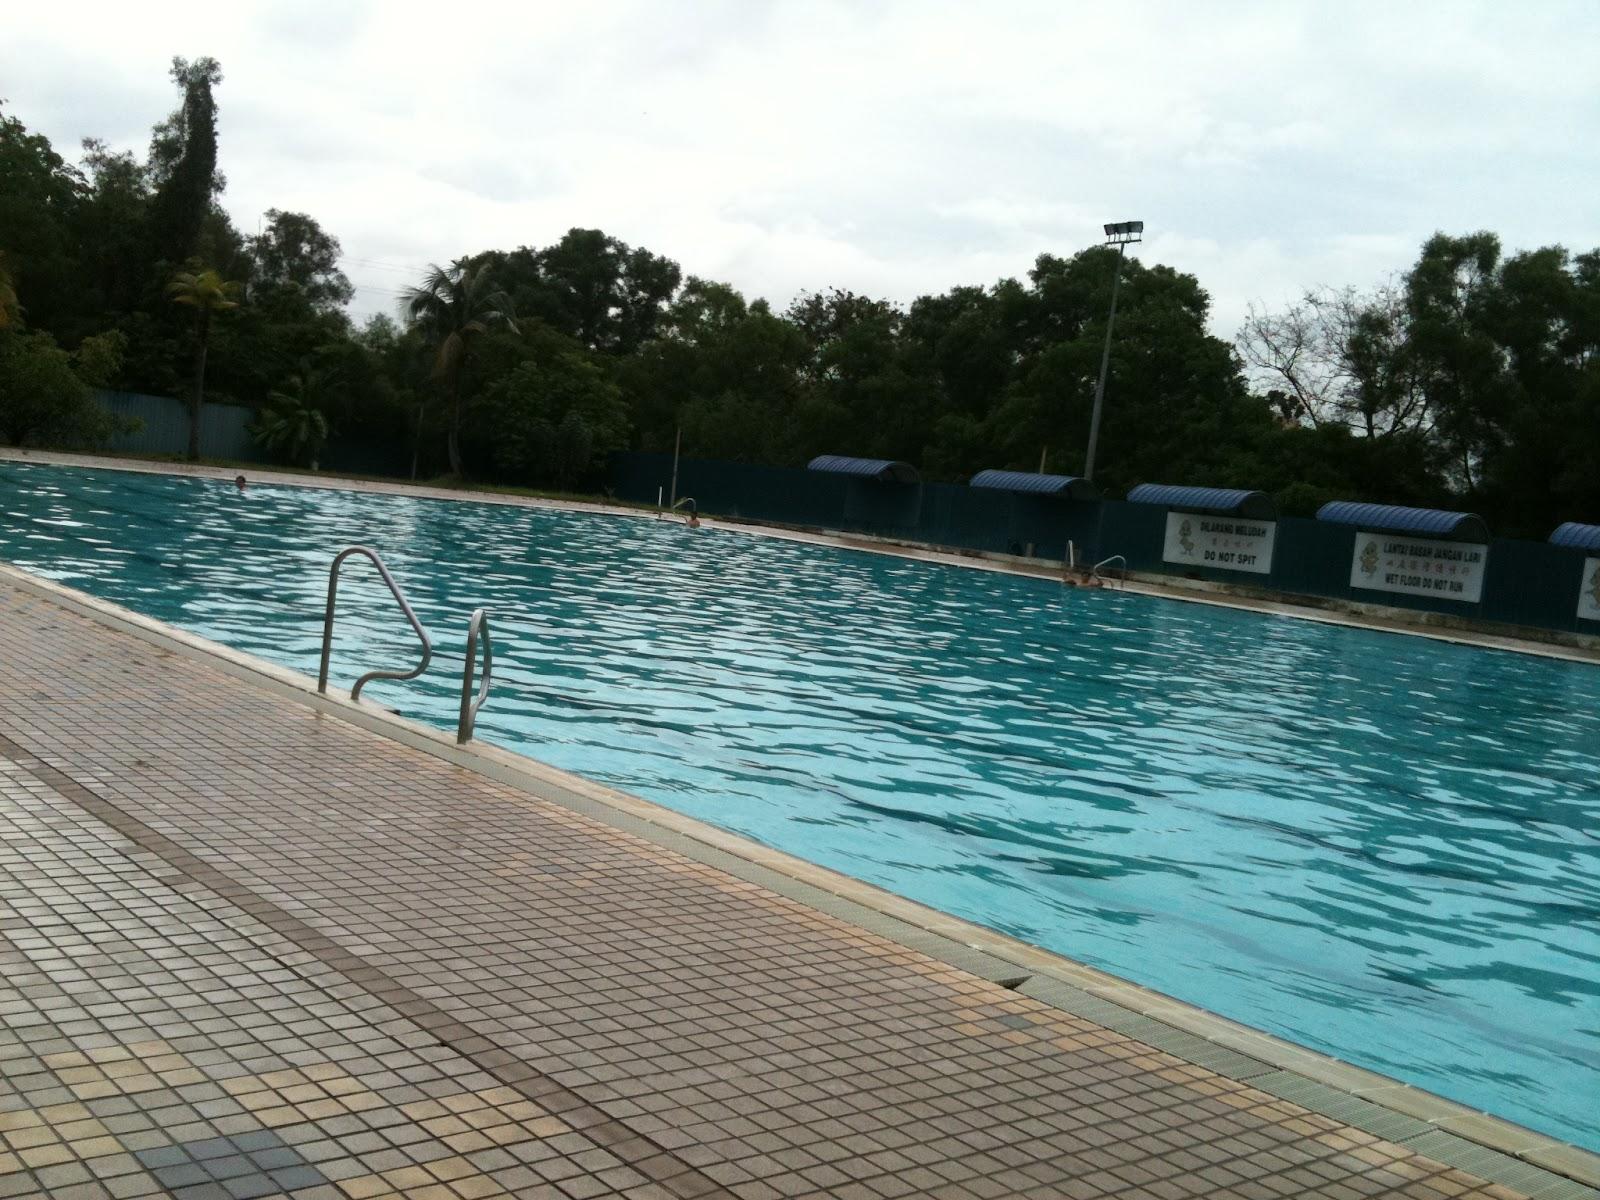 Marinestars swimming team mst penang malaysia - Seberang jaya public swimming pool ...